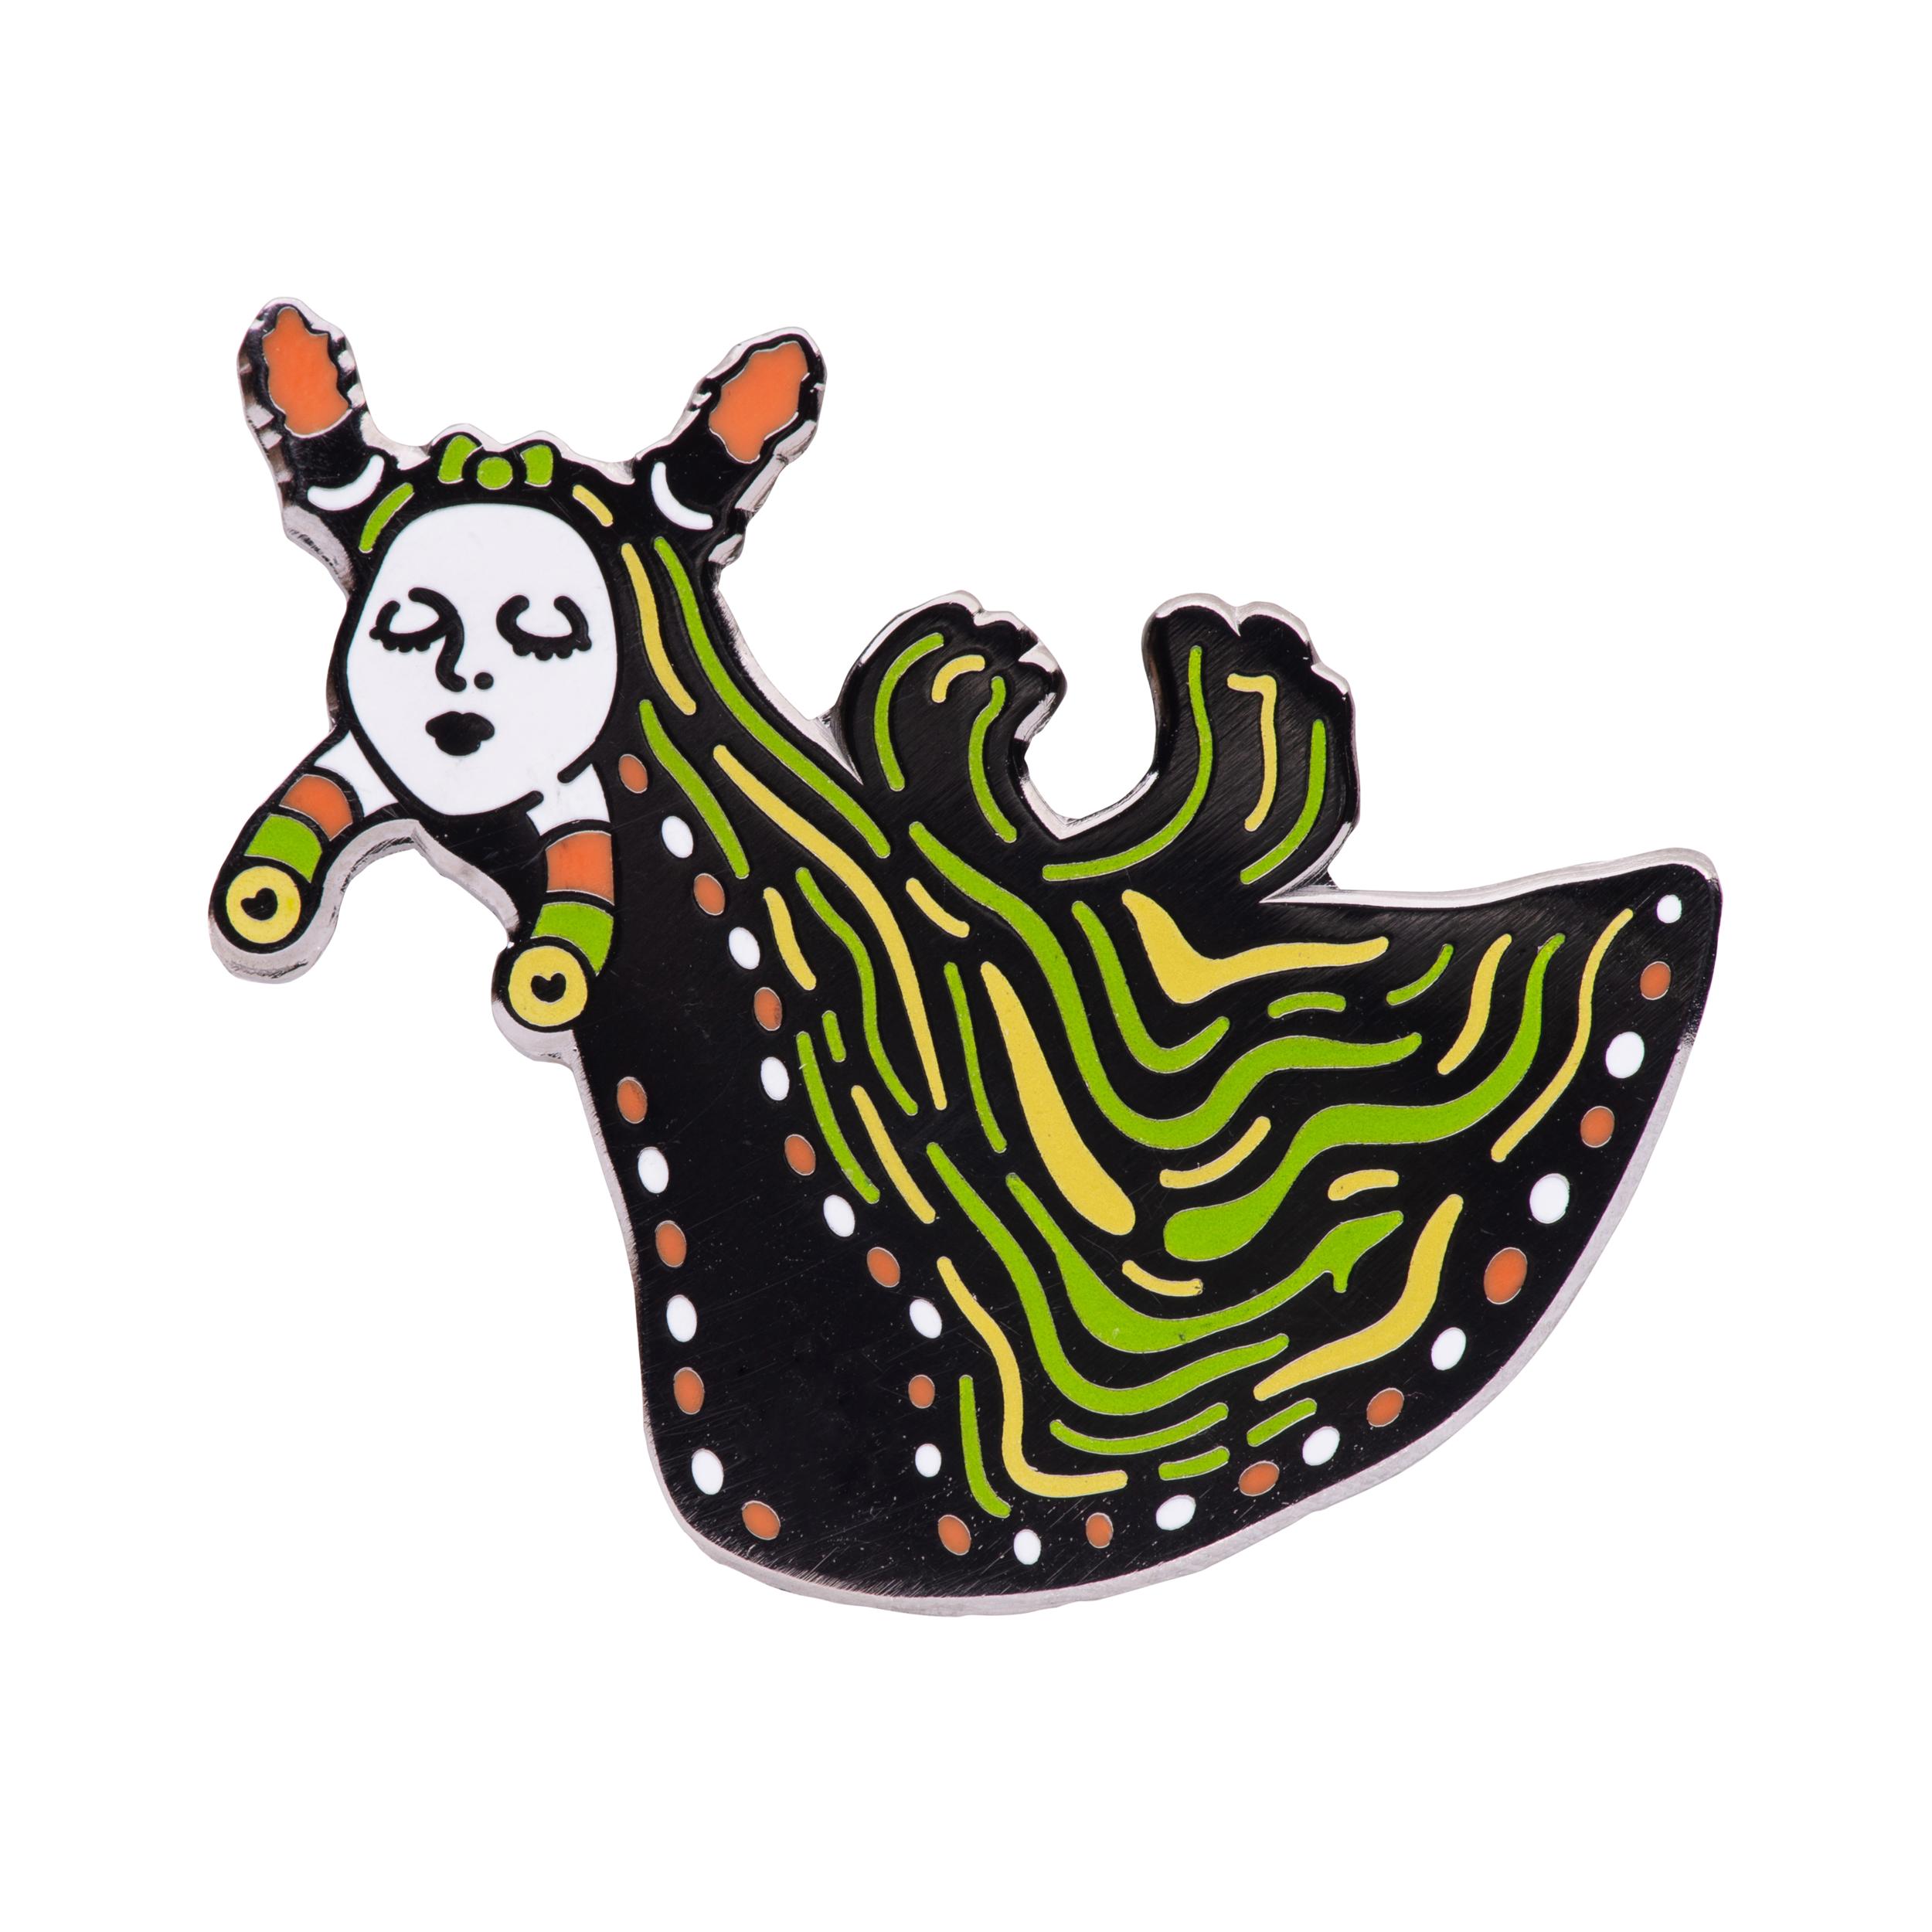 Sea Slug (glow-in-the-dark)